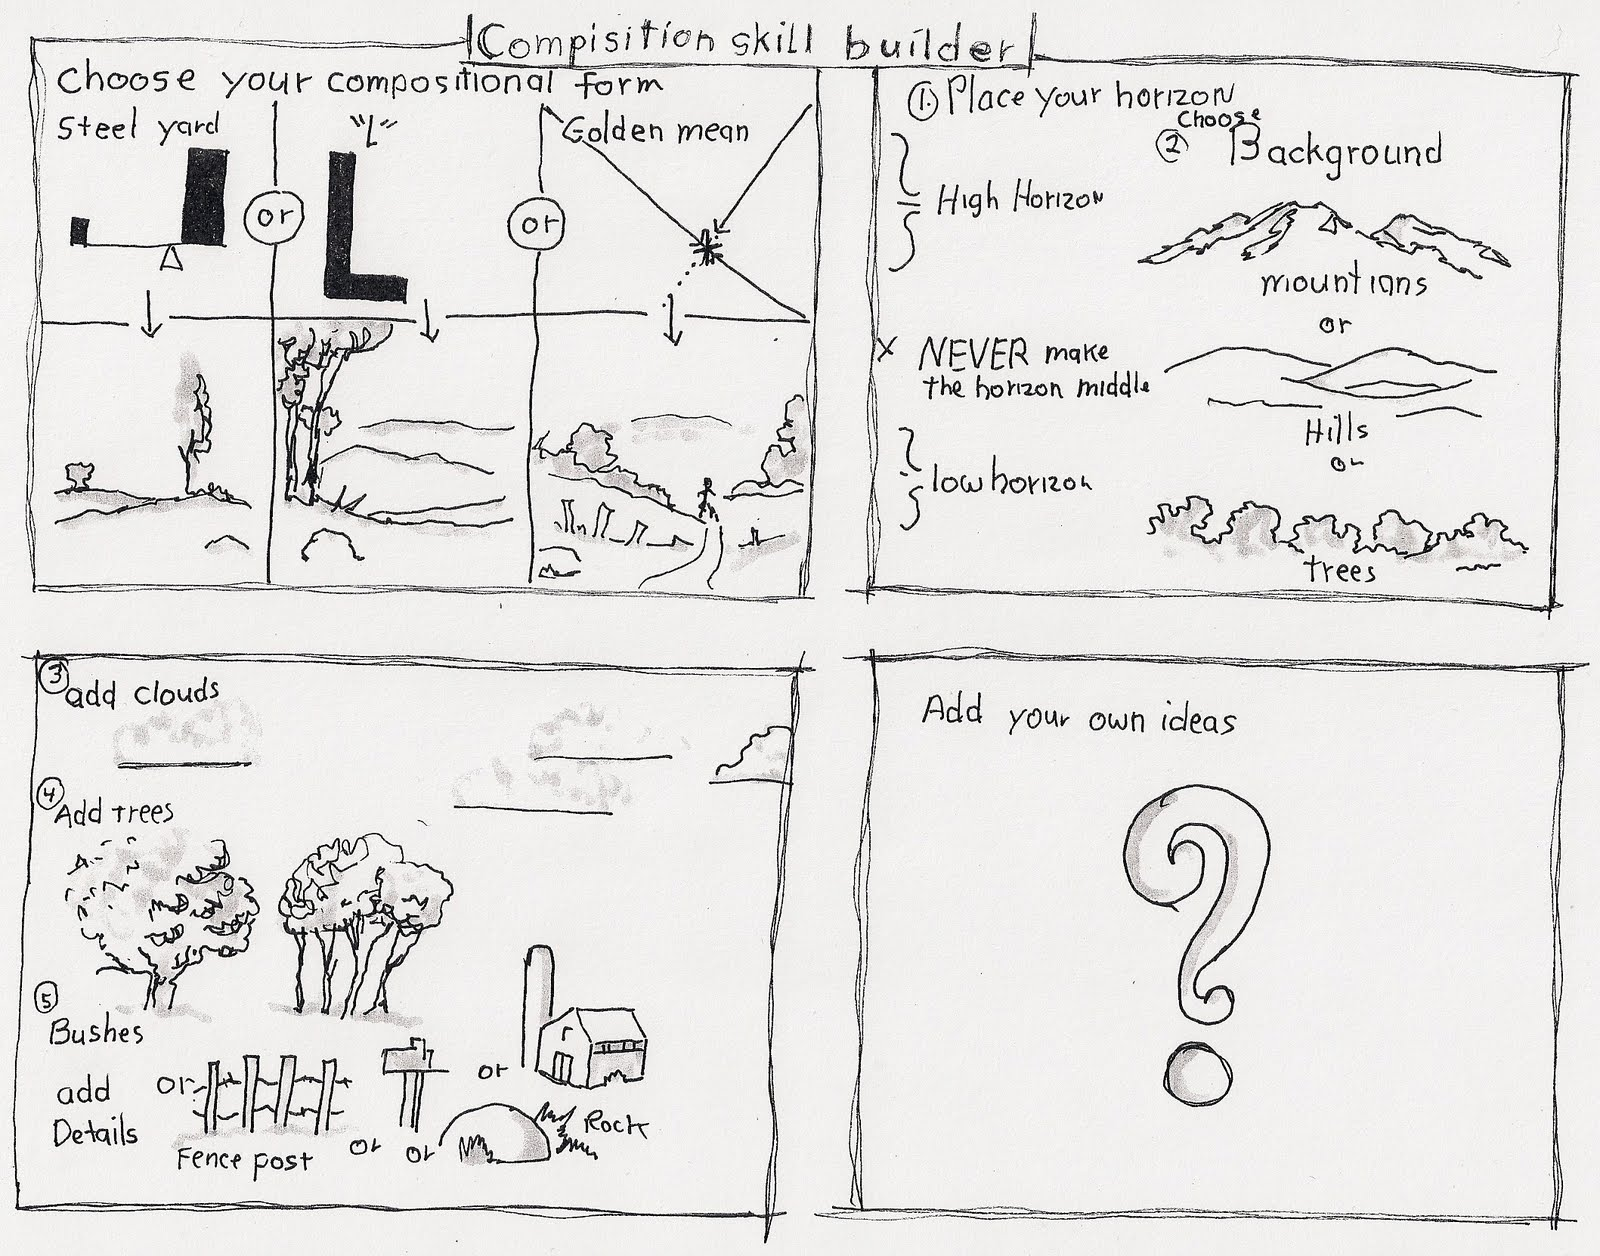 Adron S Art Lesson Plans Composition Skillbuilder For